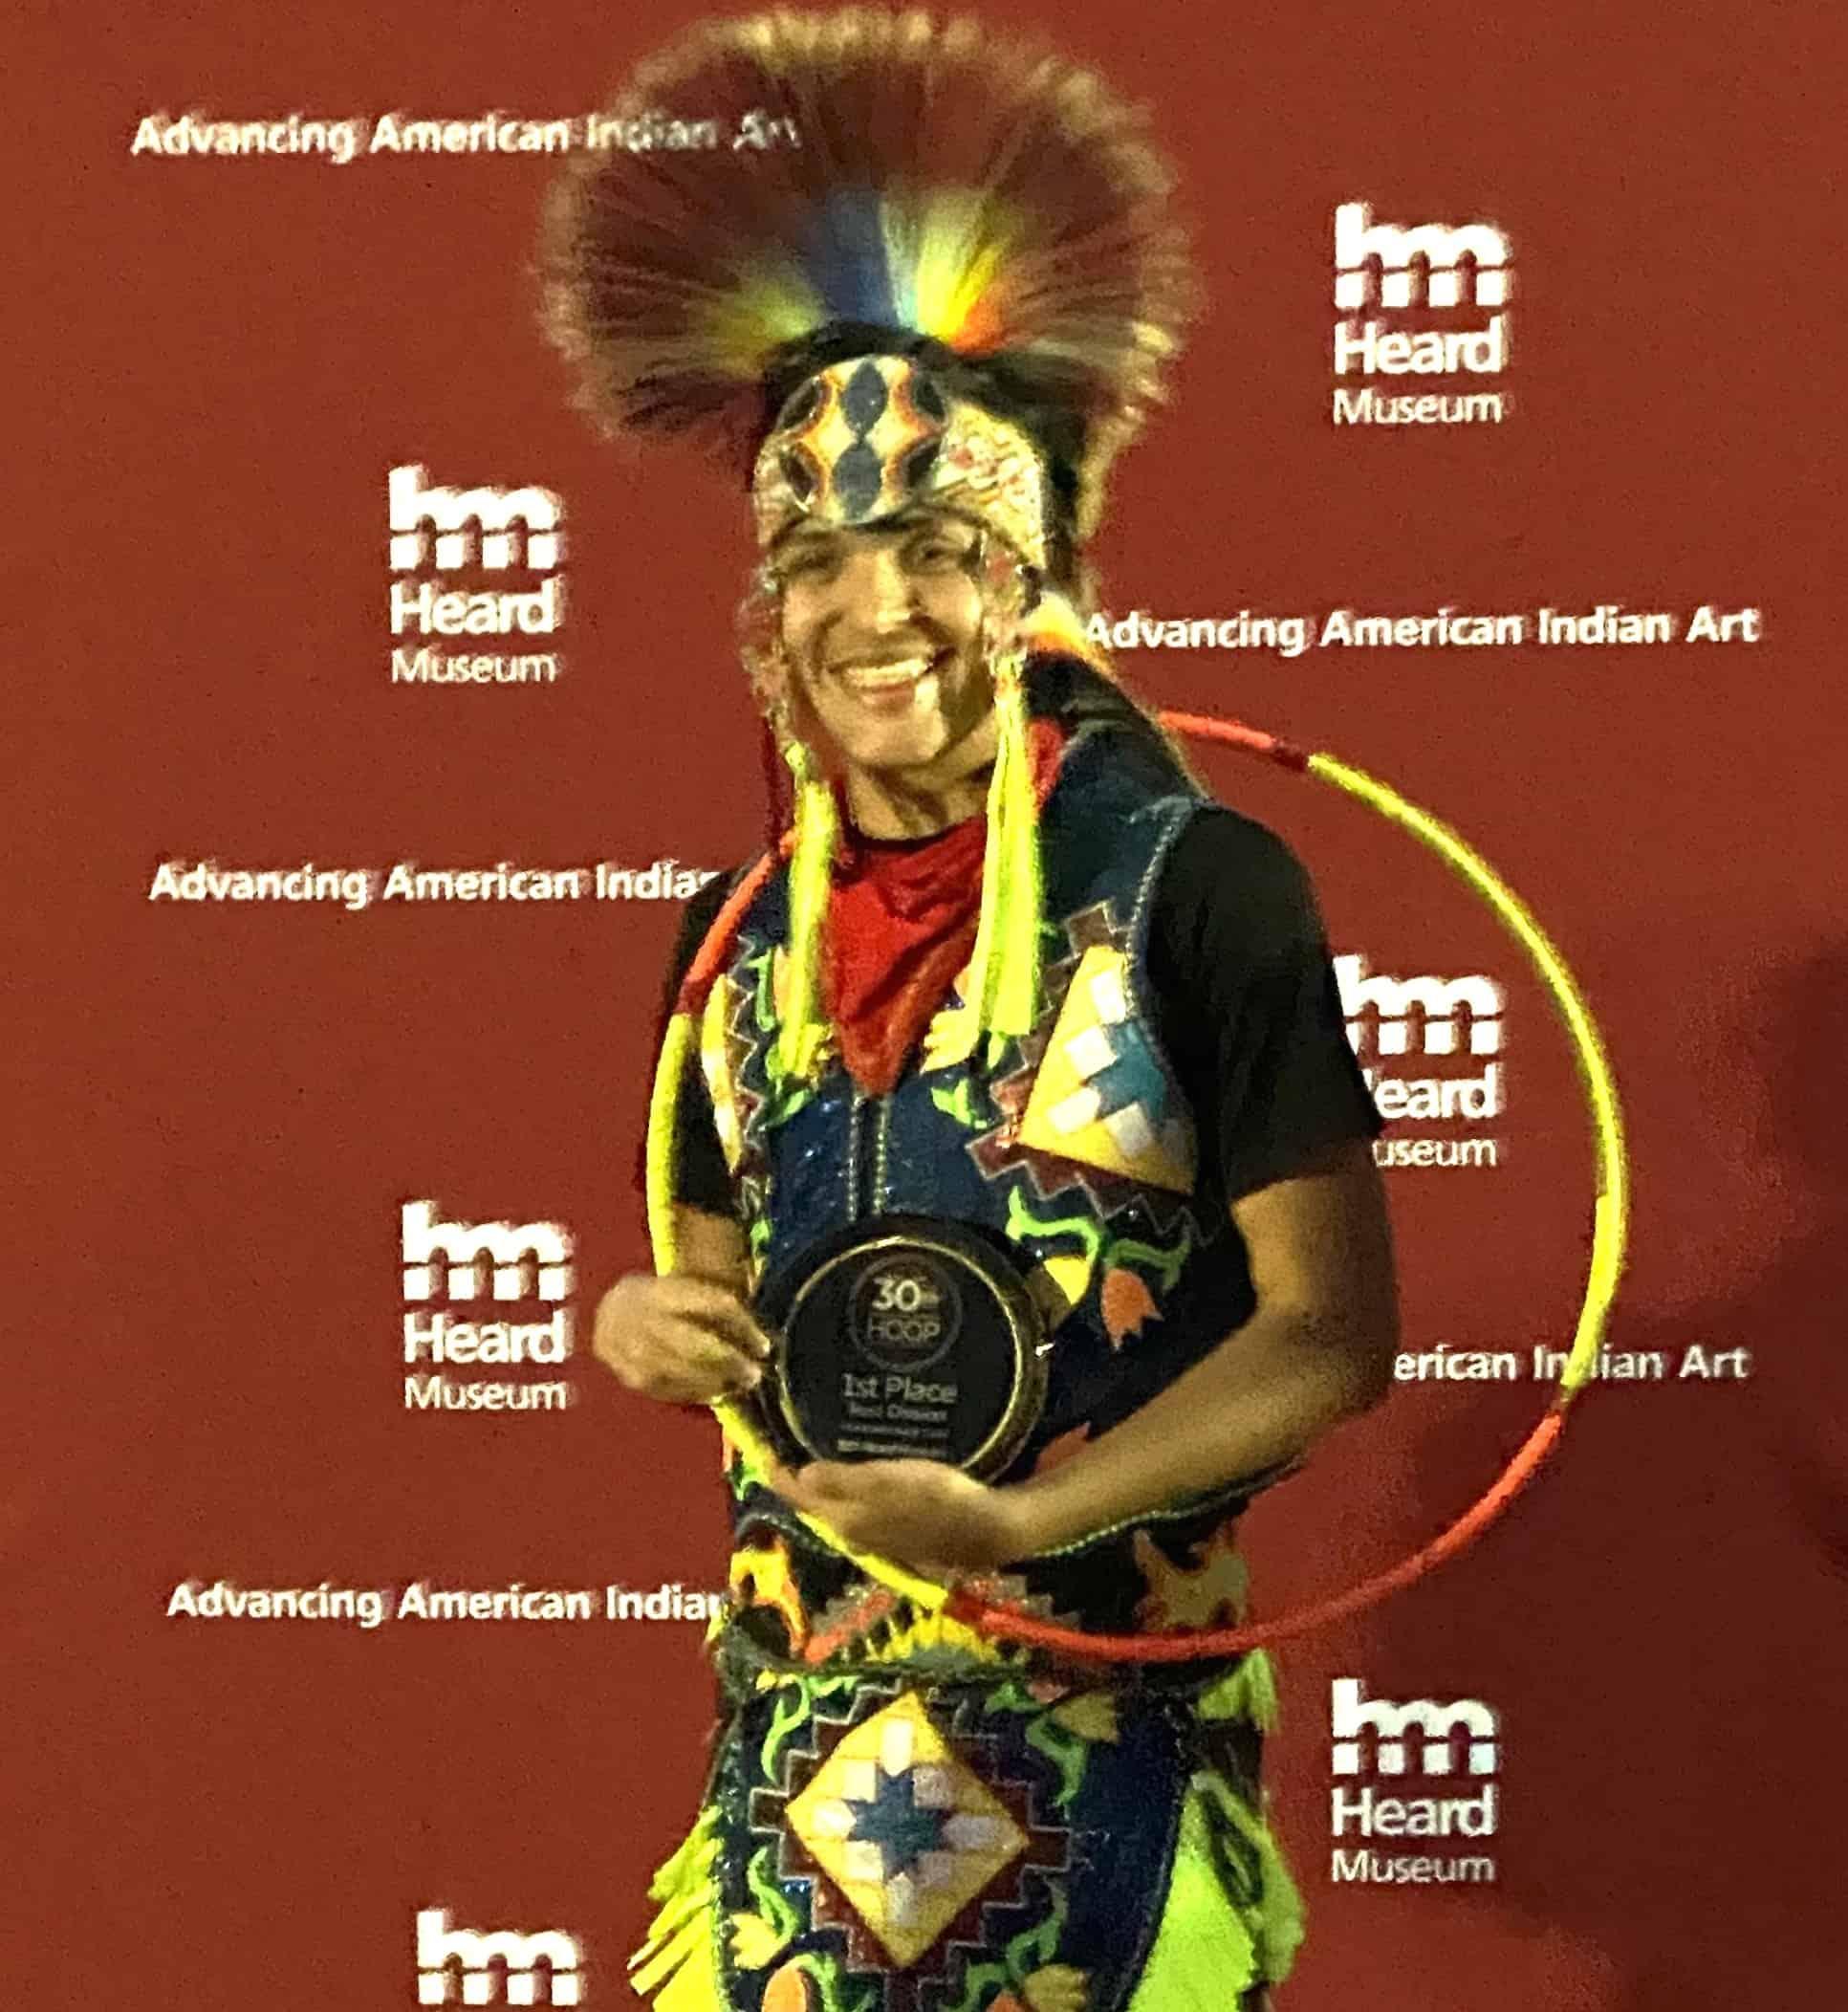 Nedallas Hammill - 2020 World Teen Hoop Dance Champion